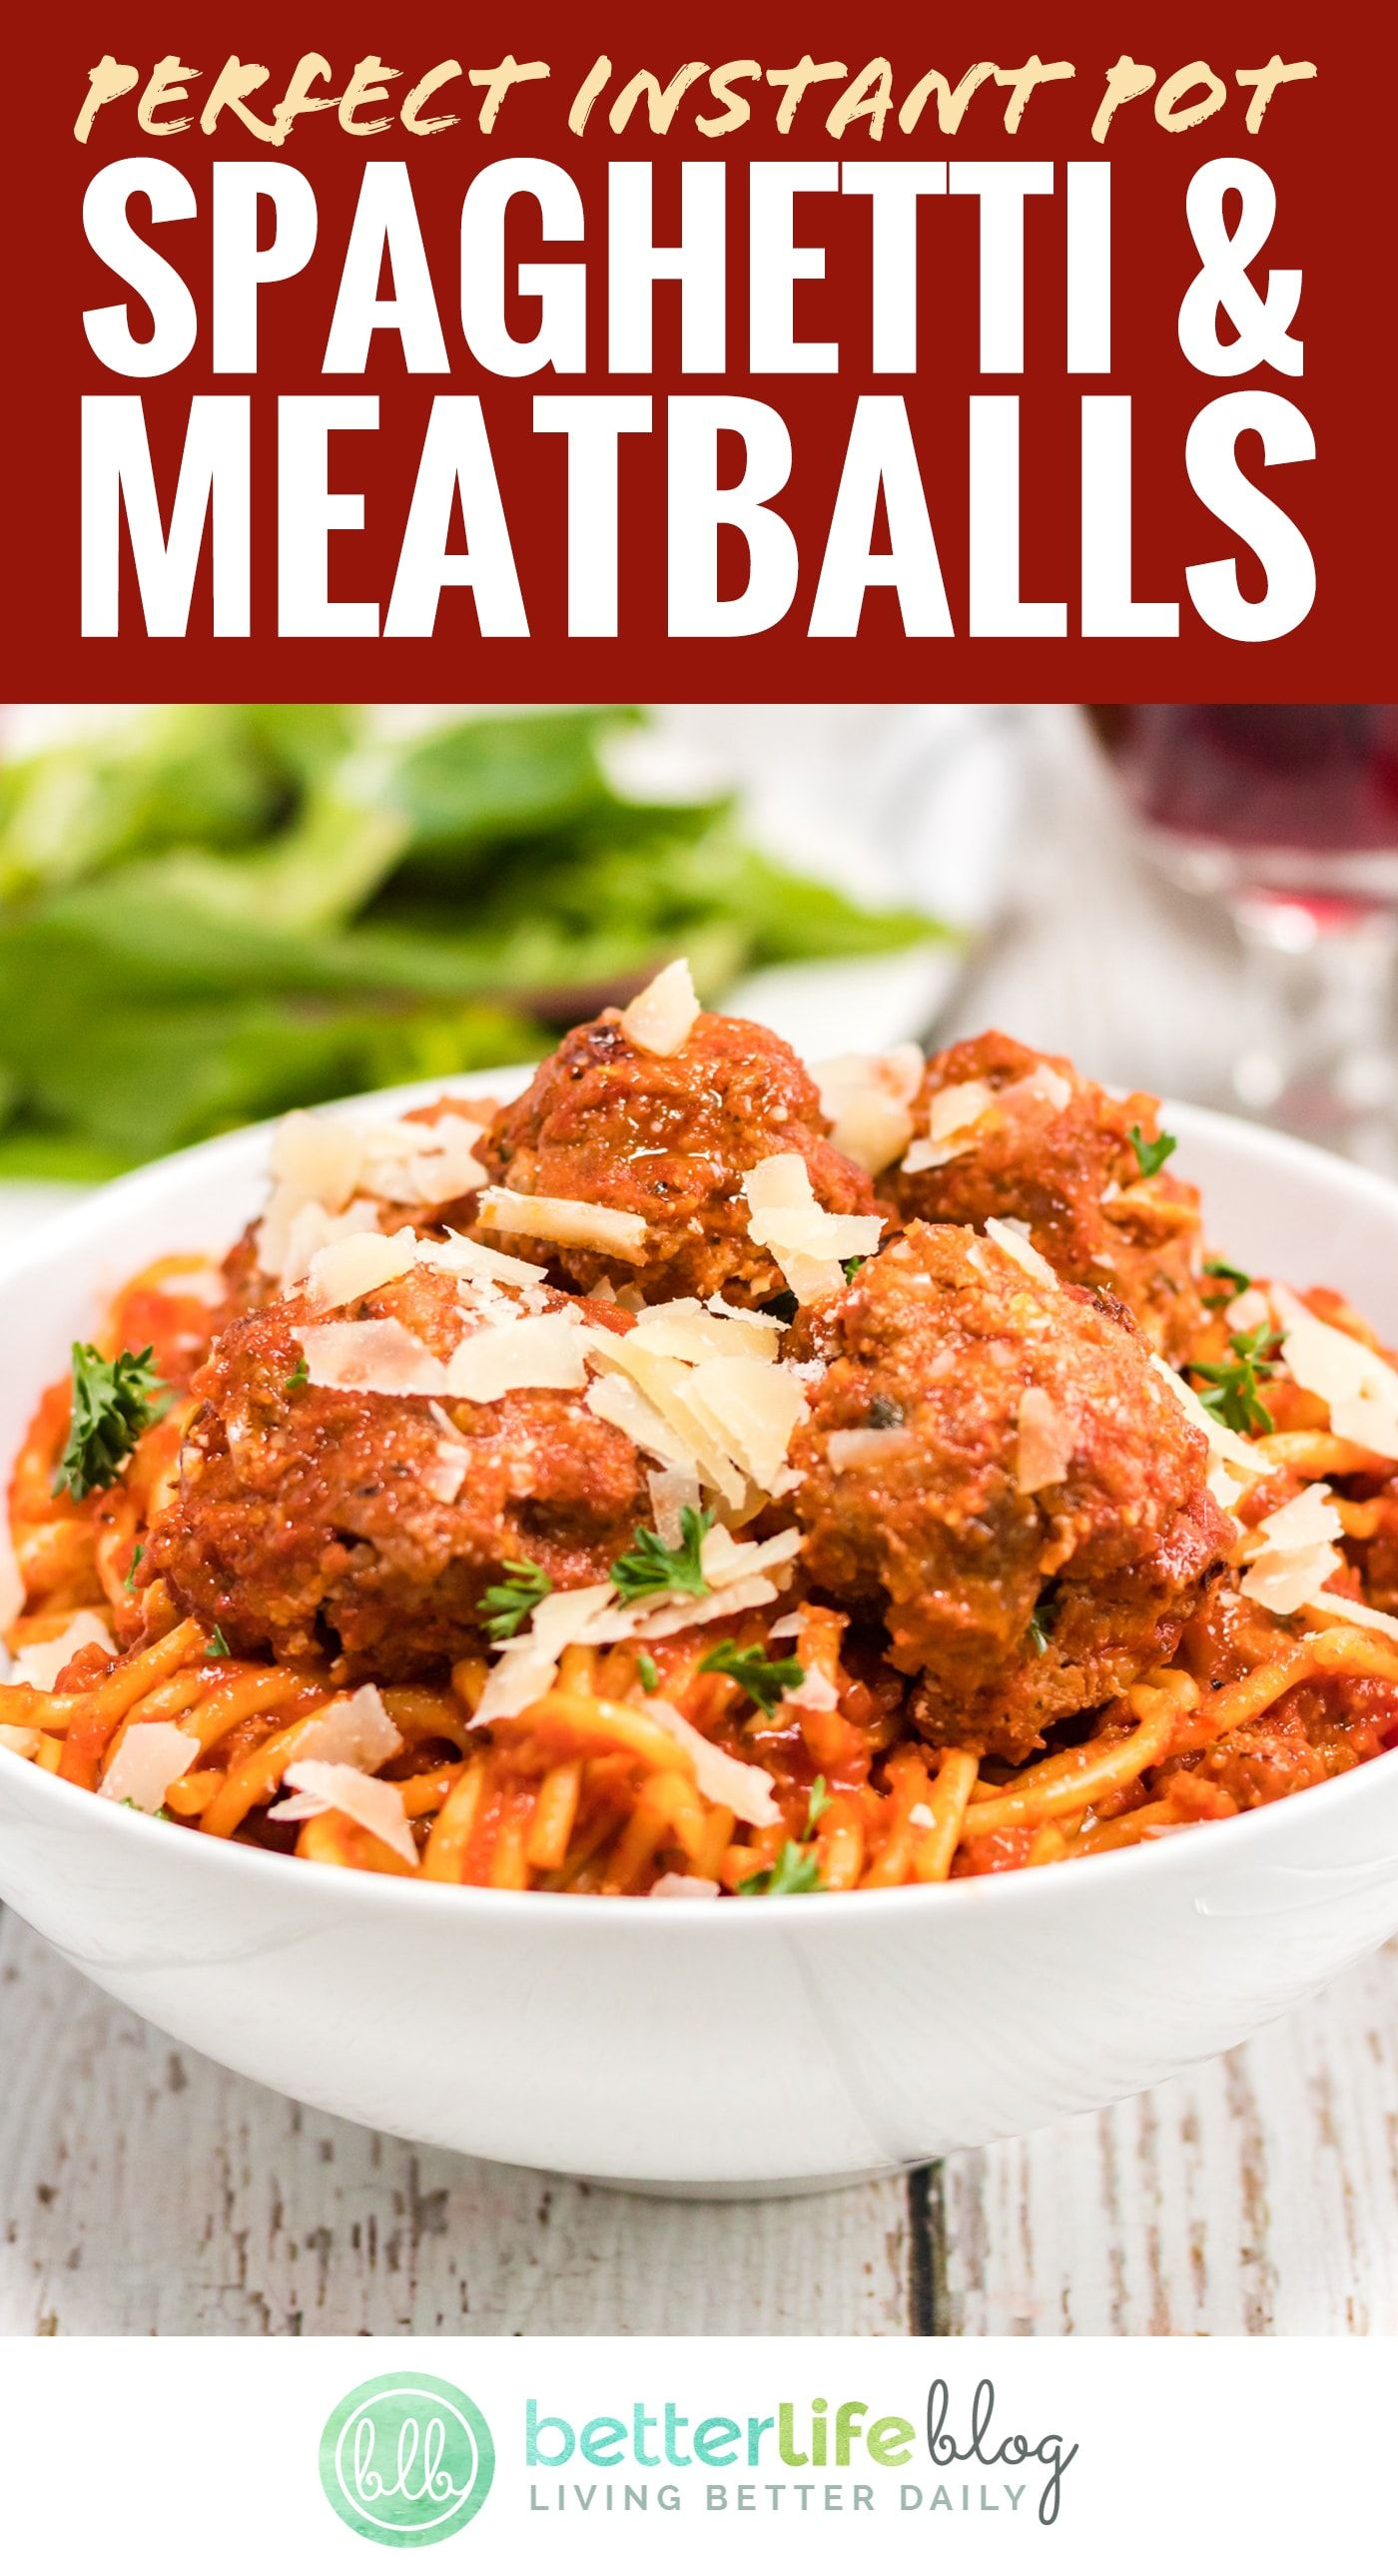 Instant pot spaghetti meatballs restaurant recipe